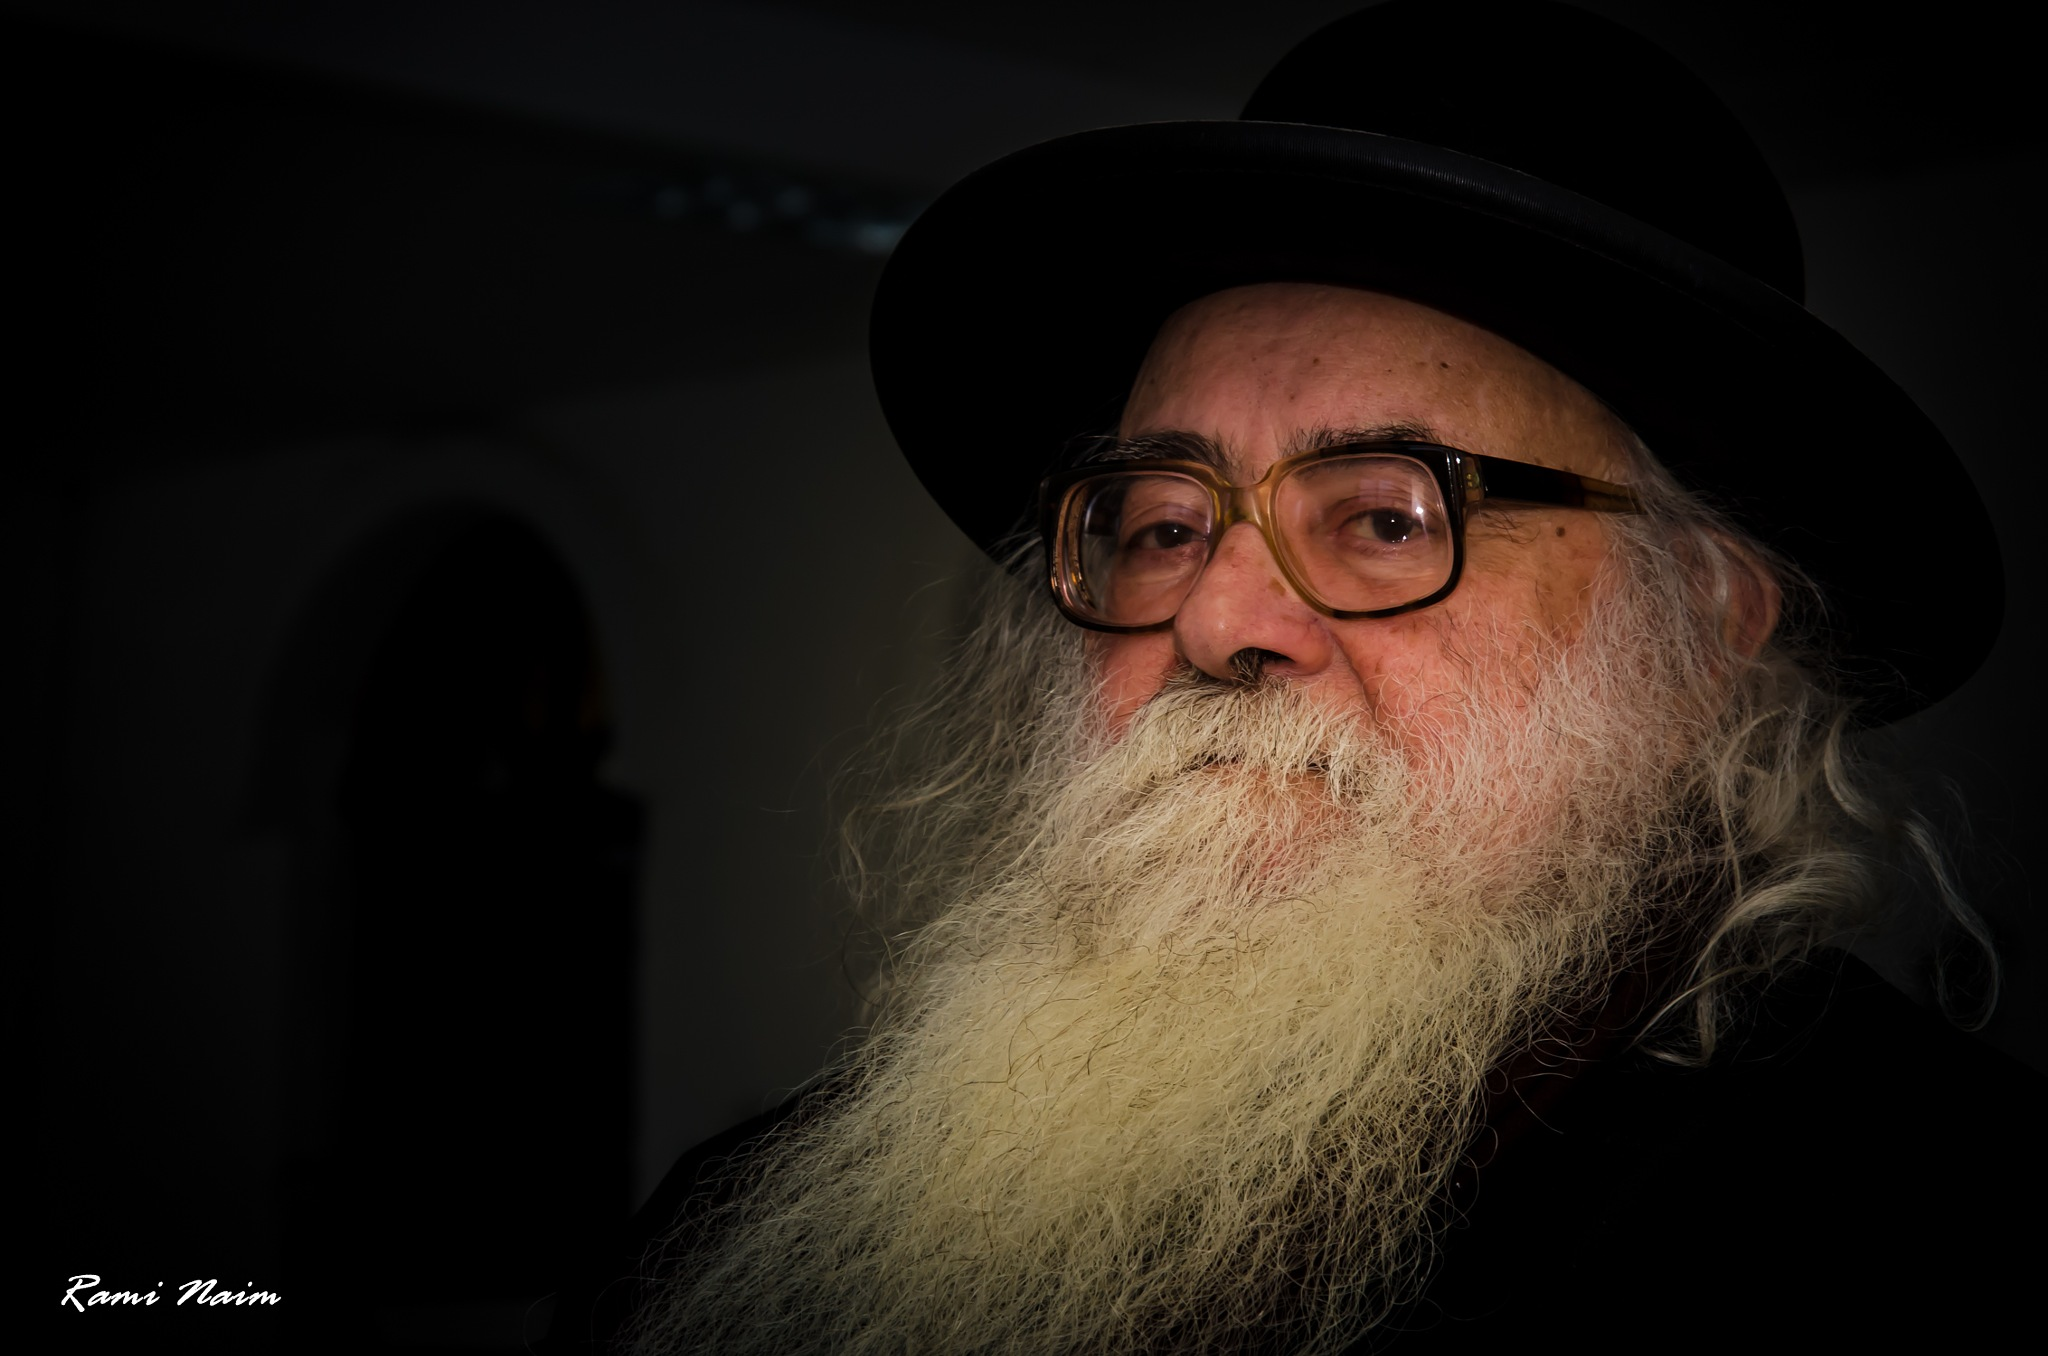 Rabbi, rest in peace by raminaim